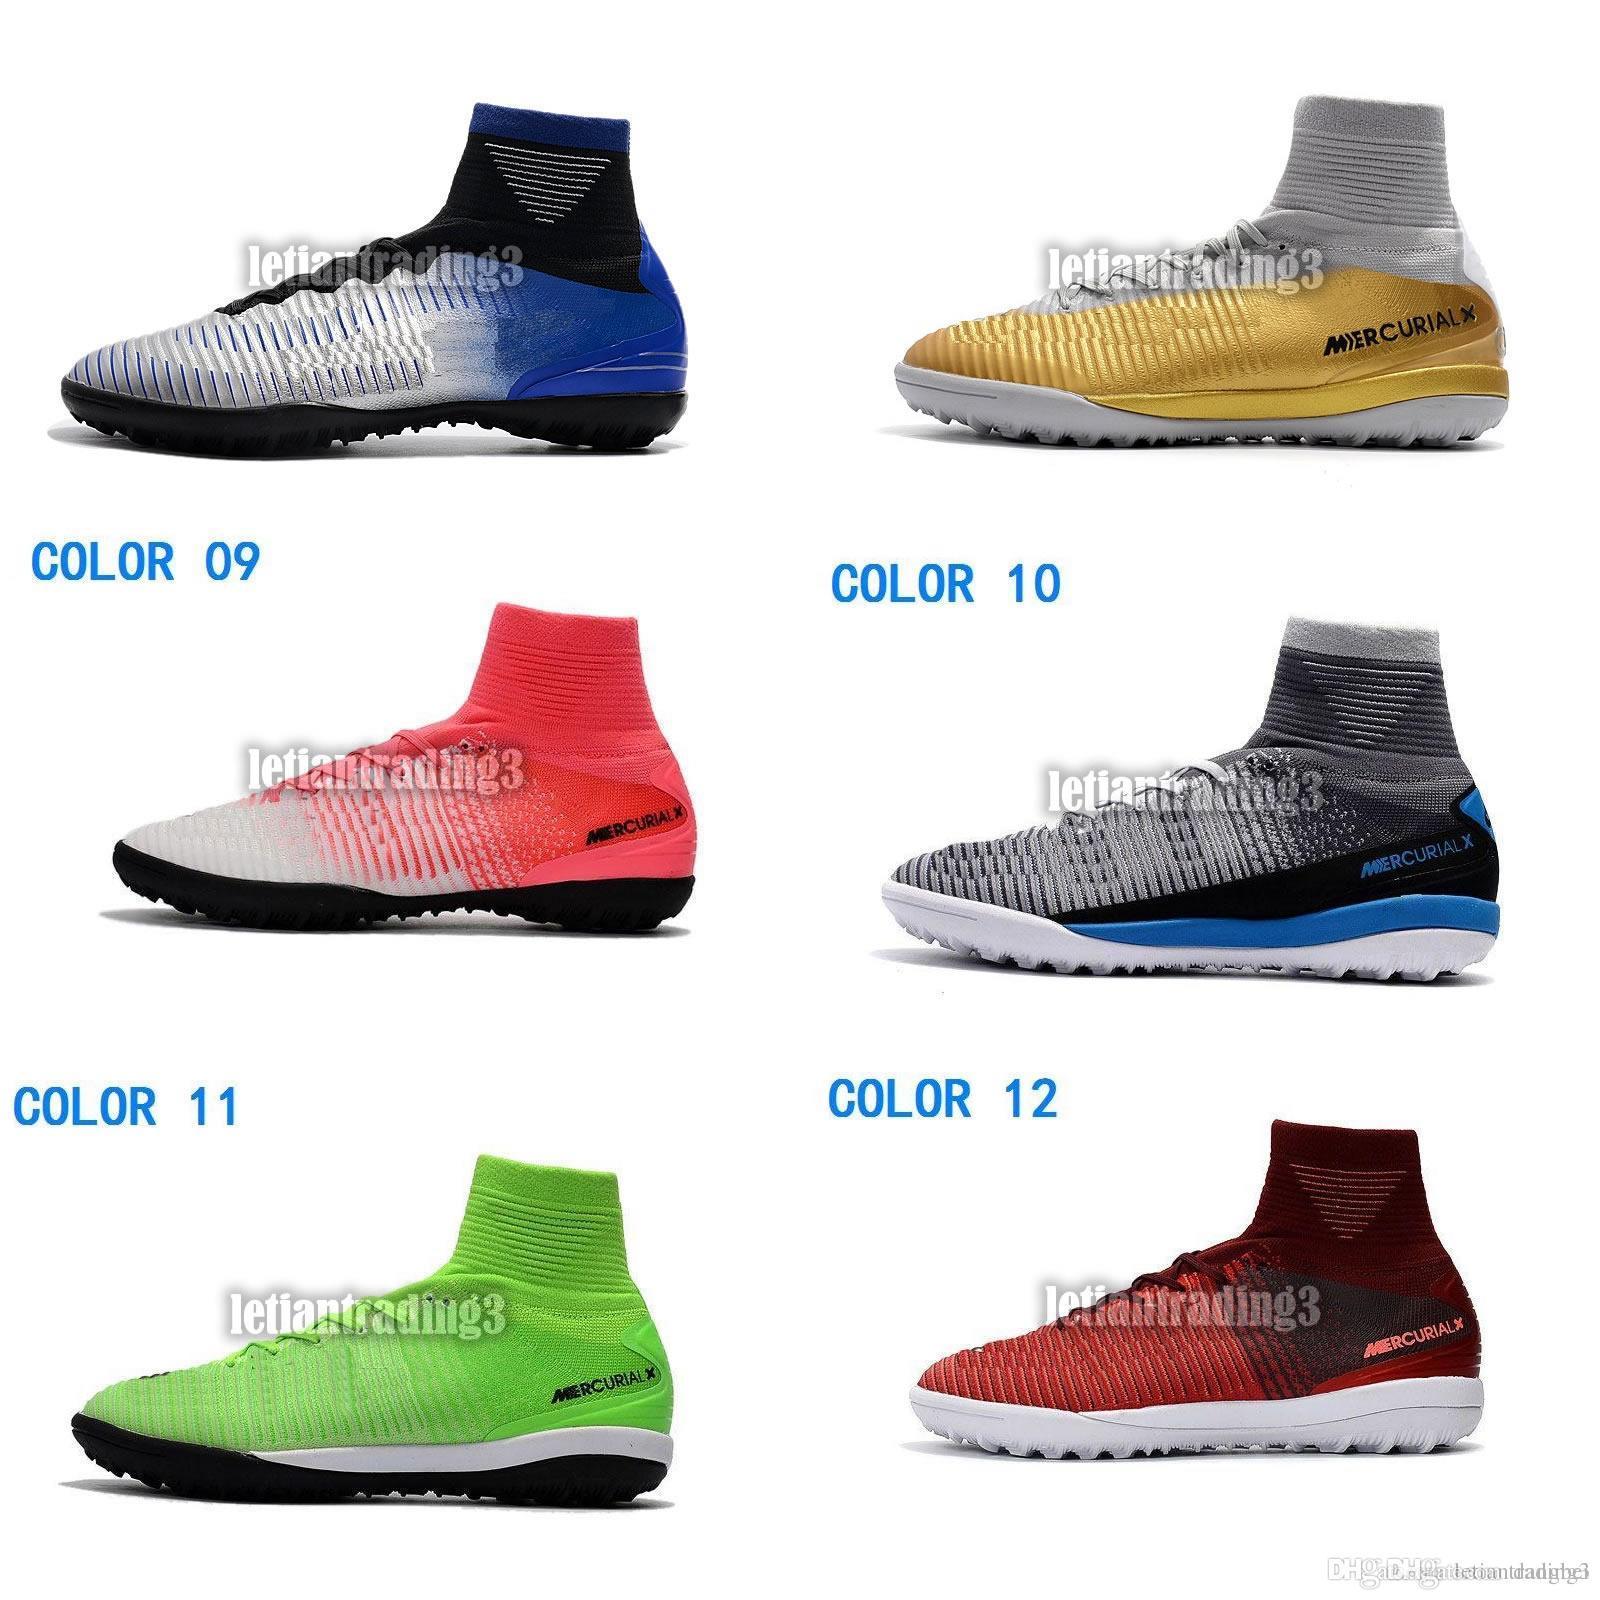 f9b67d4808da 2018 New Original Indoor Soccer Cleats Turf MercurialX Proximo TF IC Soccer  Shoes Ronaldo Mercurial Superfly CR7 Neymar Football Boots